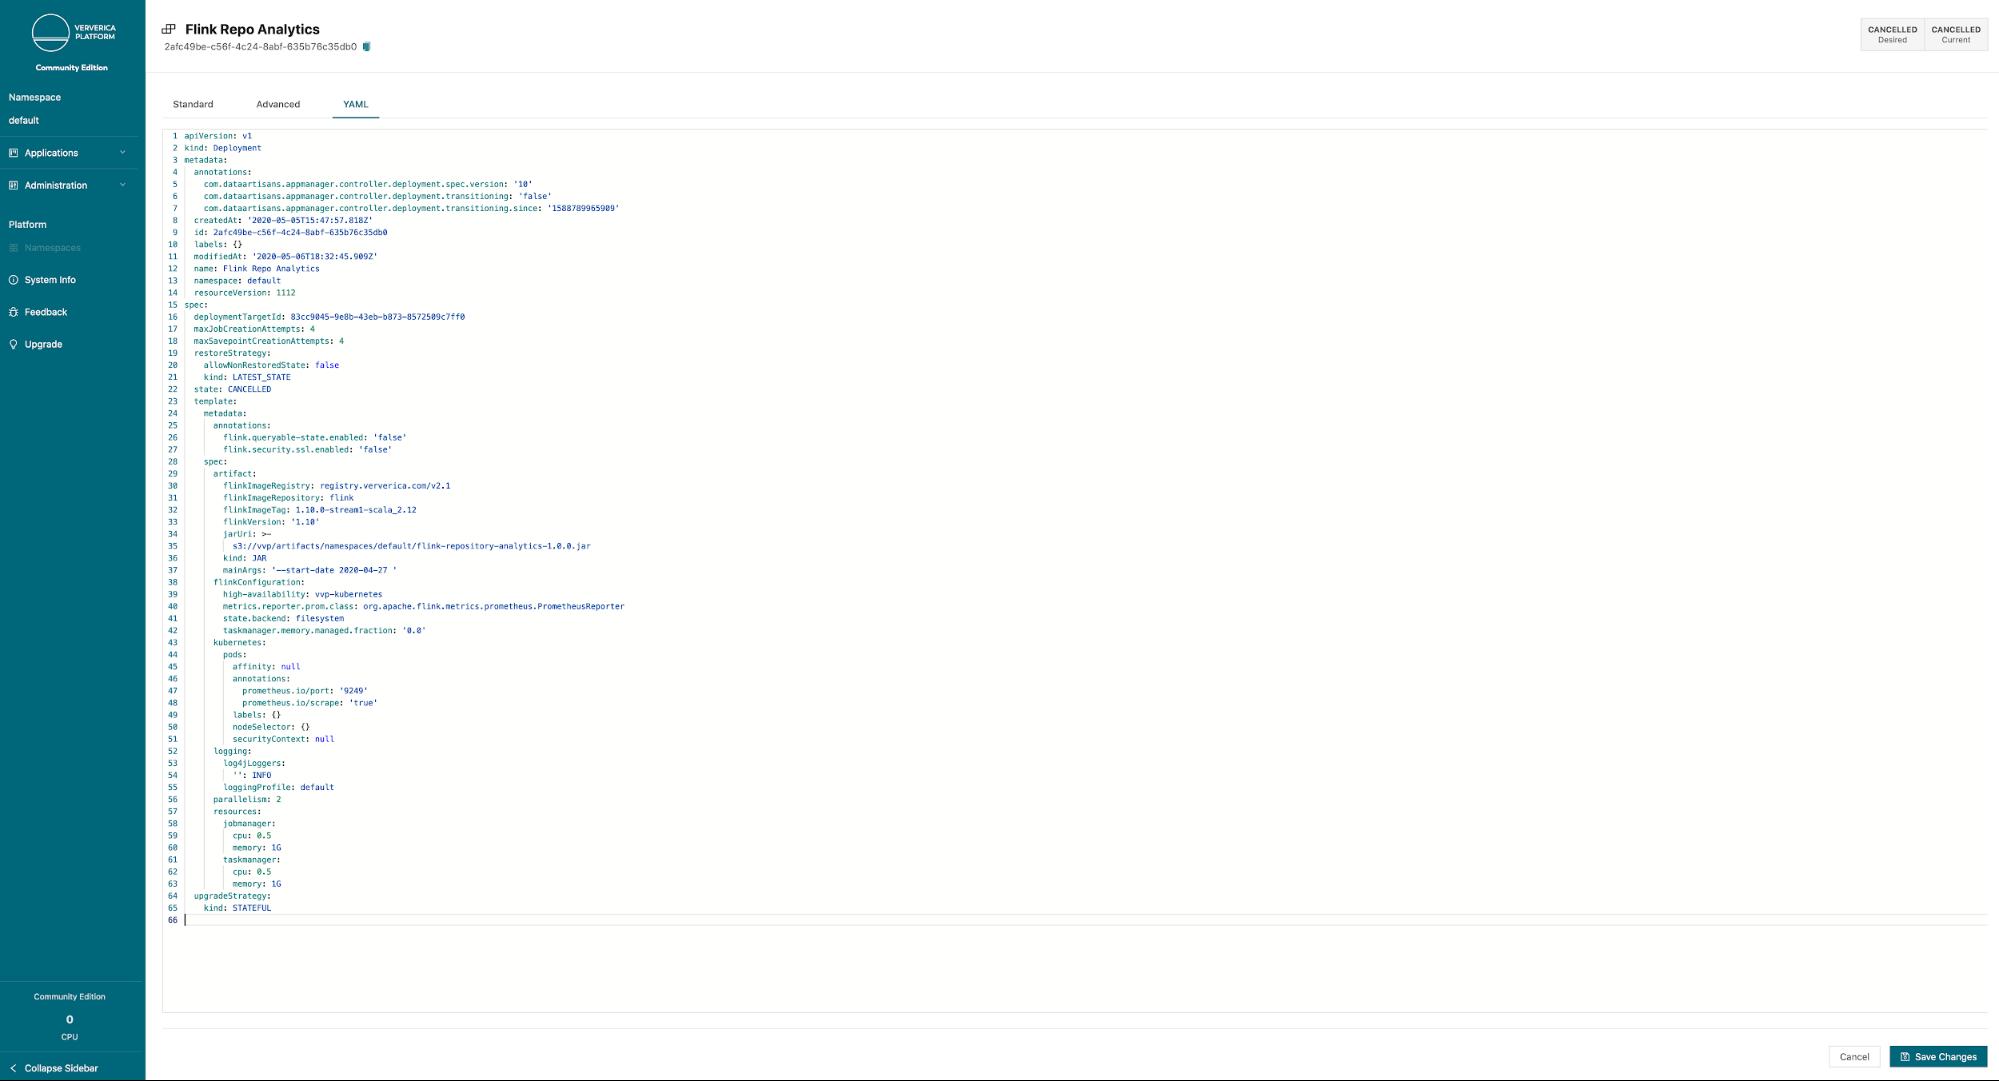 Ververica Platform Community Edition, Flink Repository, Apache Flink